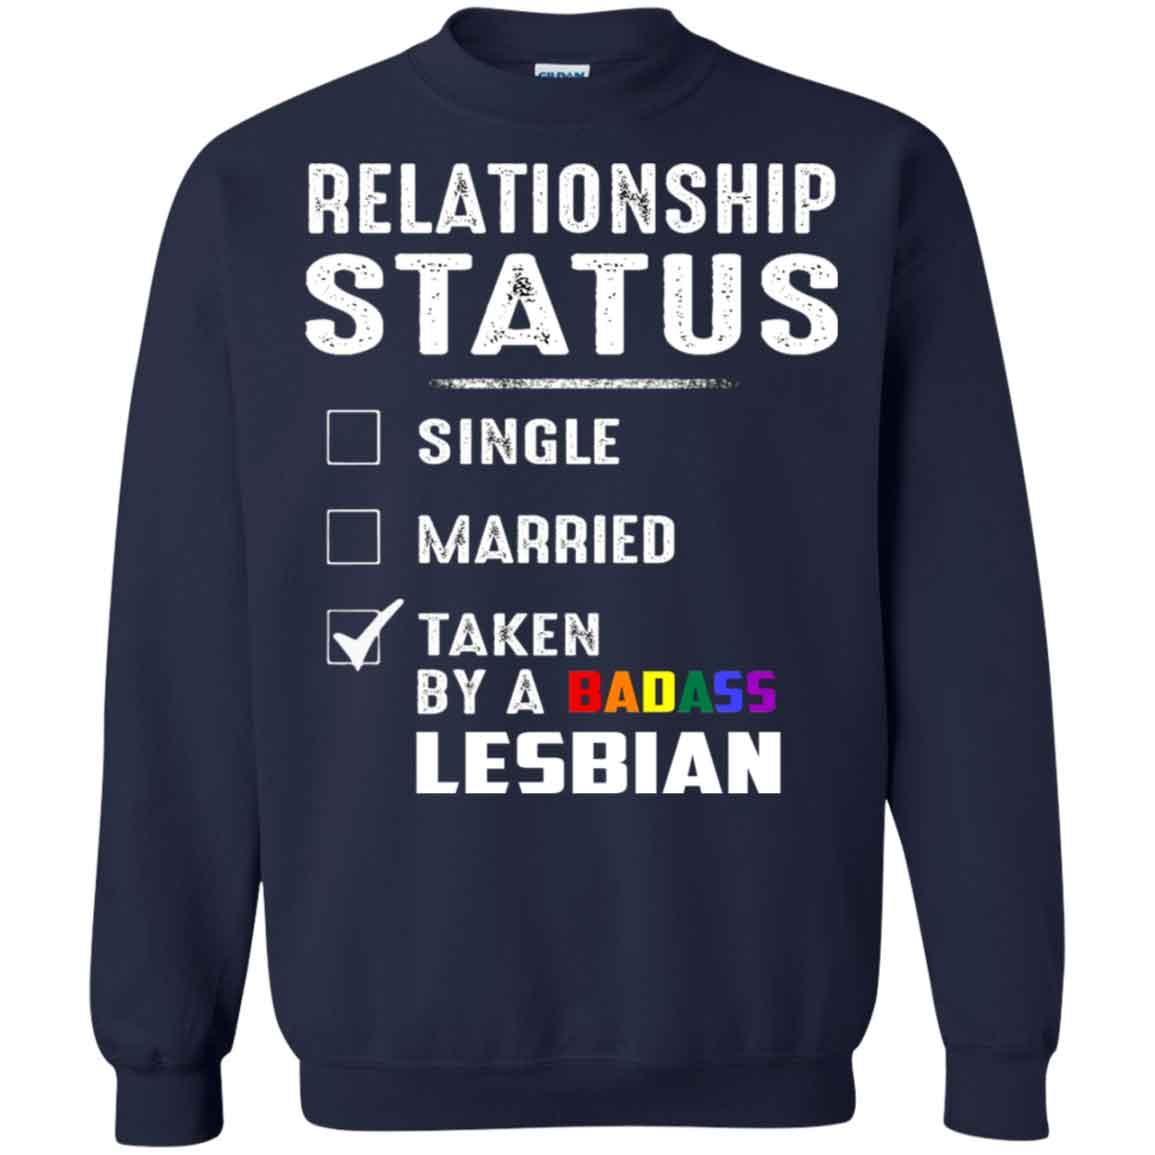 dc7fb82d7 Relationship Status Single Married Taken By A Badass Lesbian Hoodies  Sweatshirts